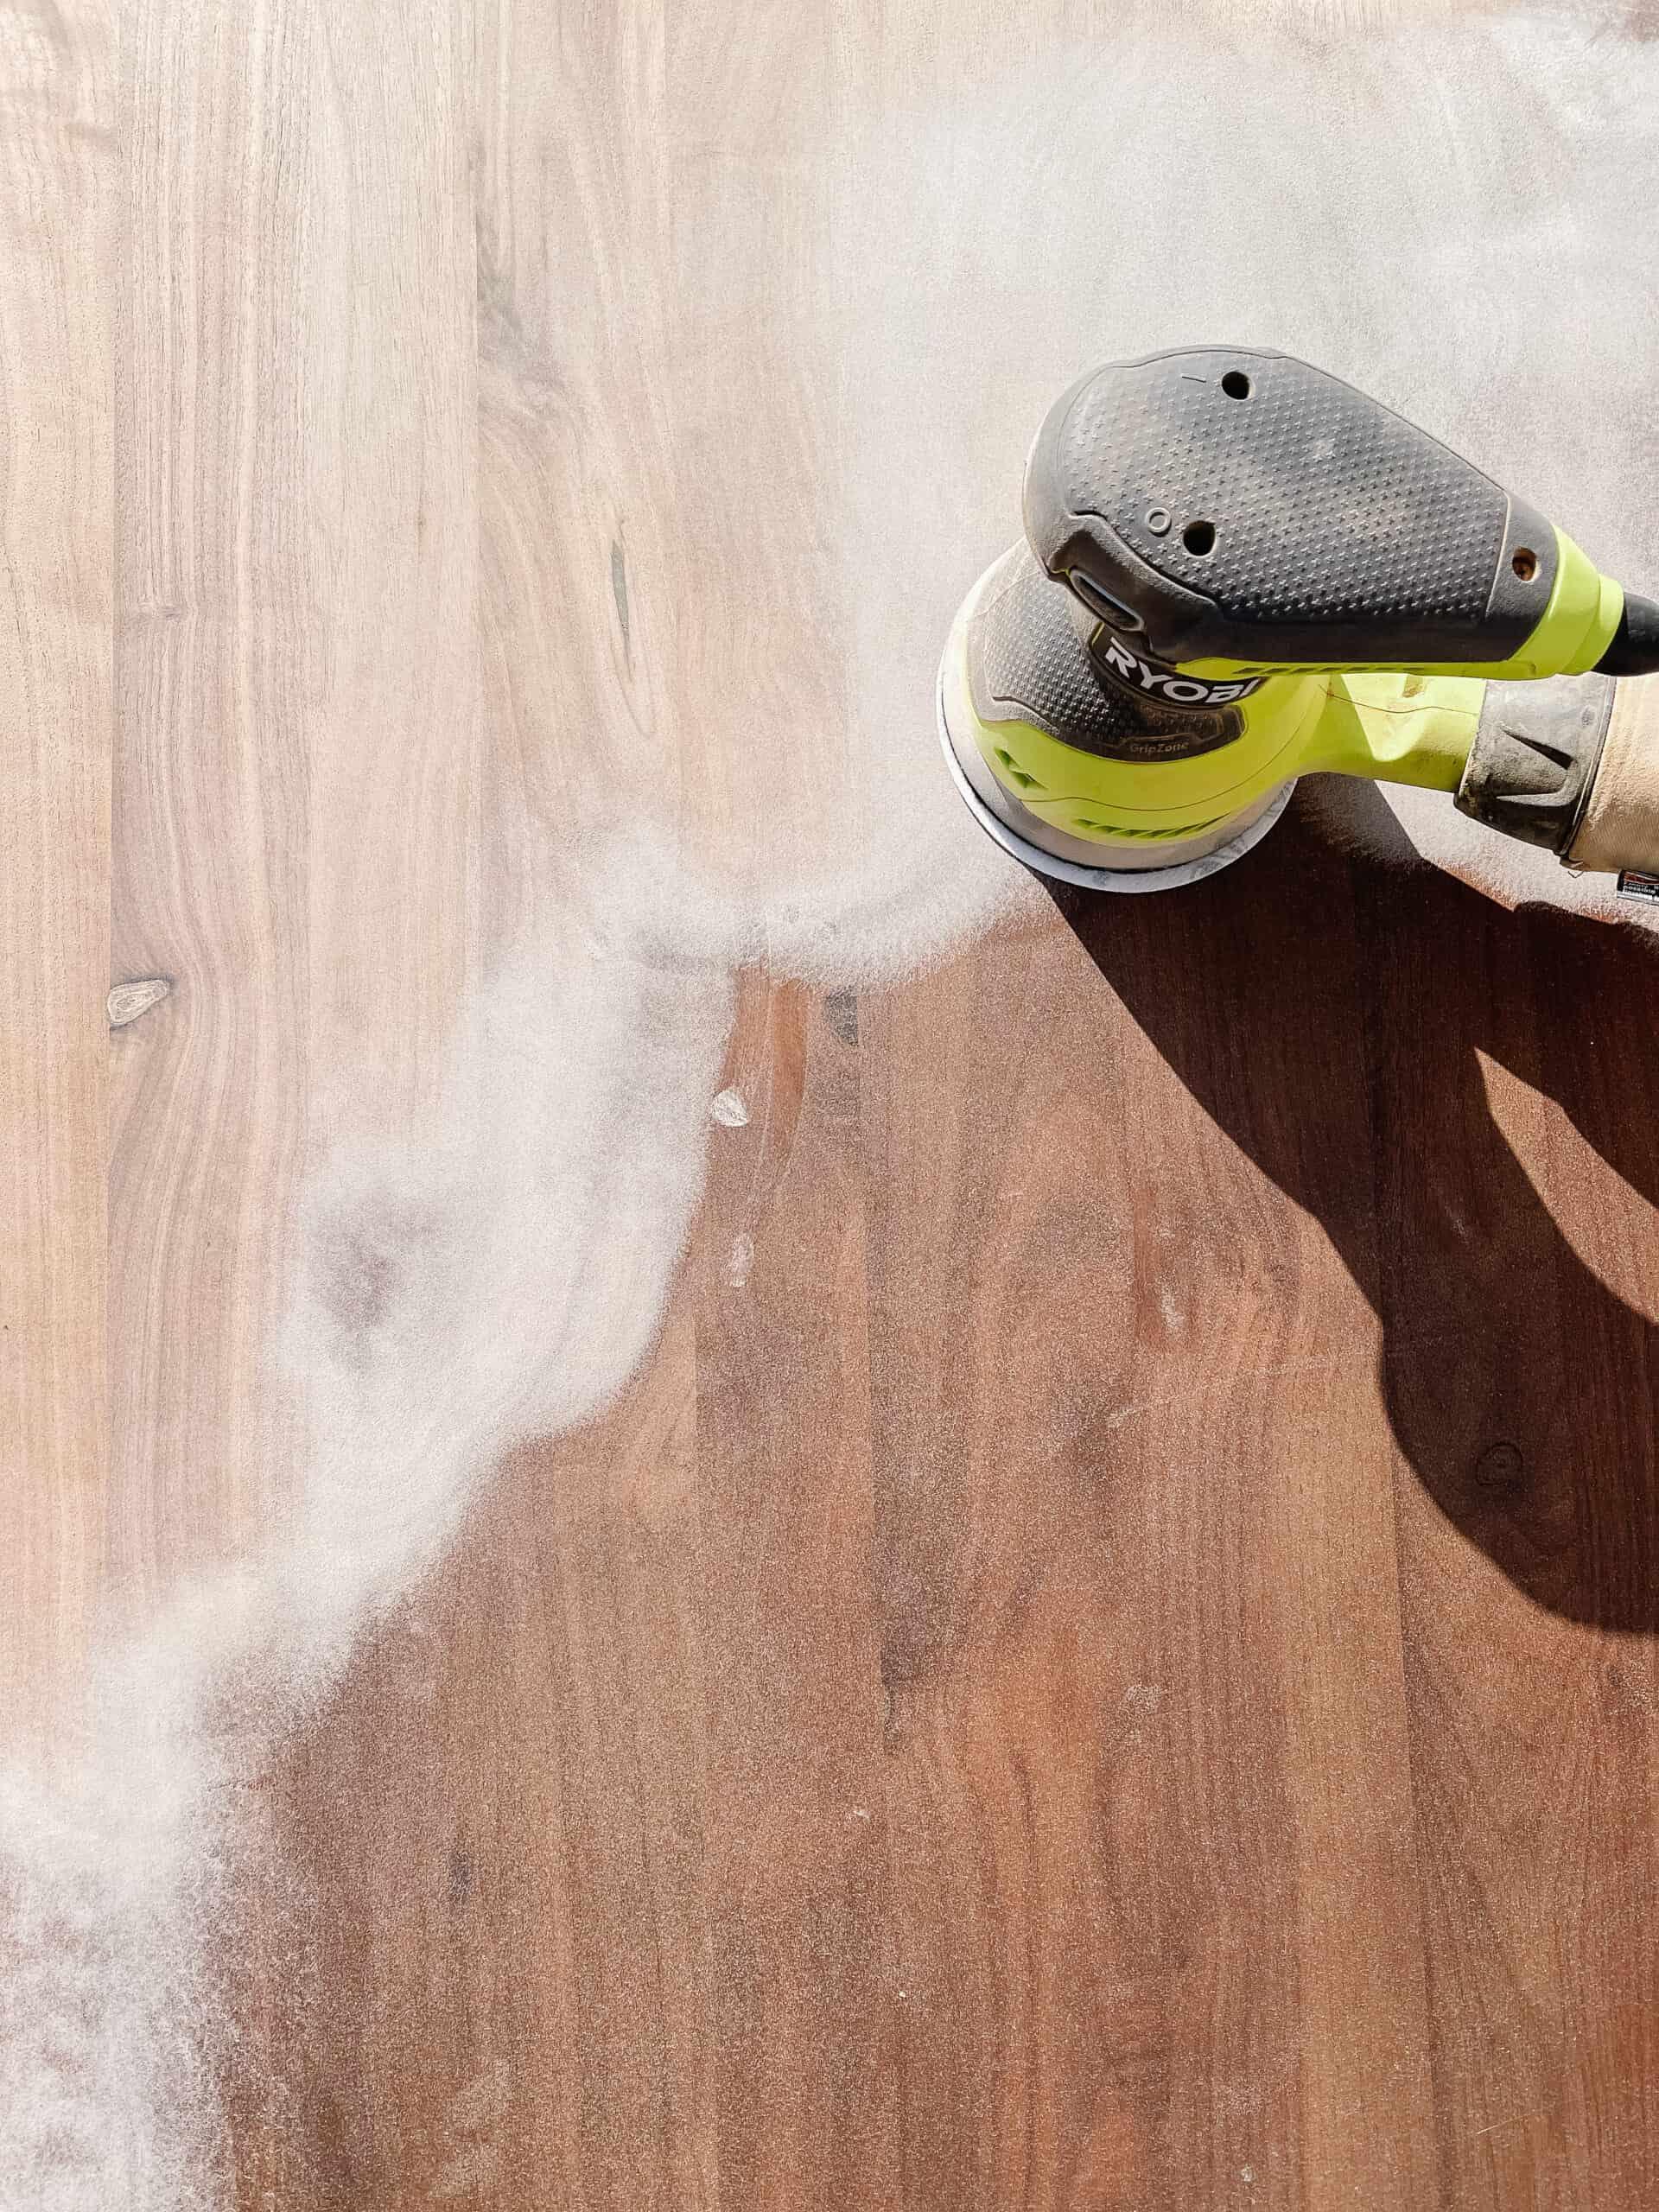 How to Sand, Bleach, and Whitewash Wood Furniture